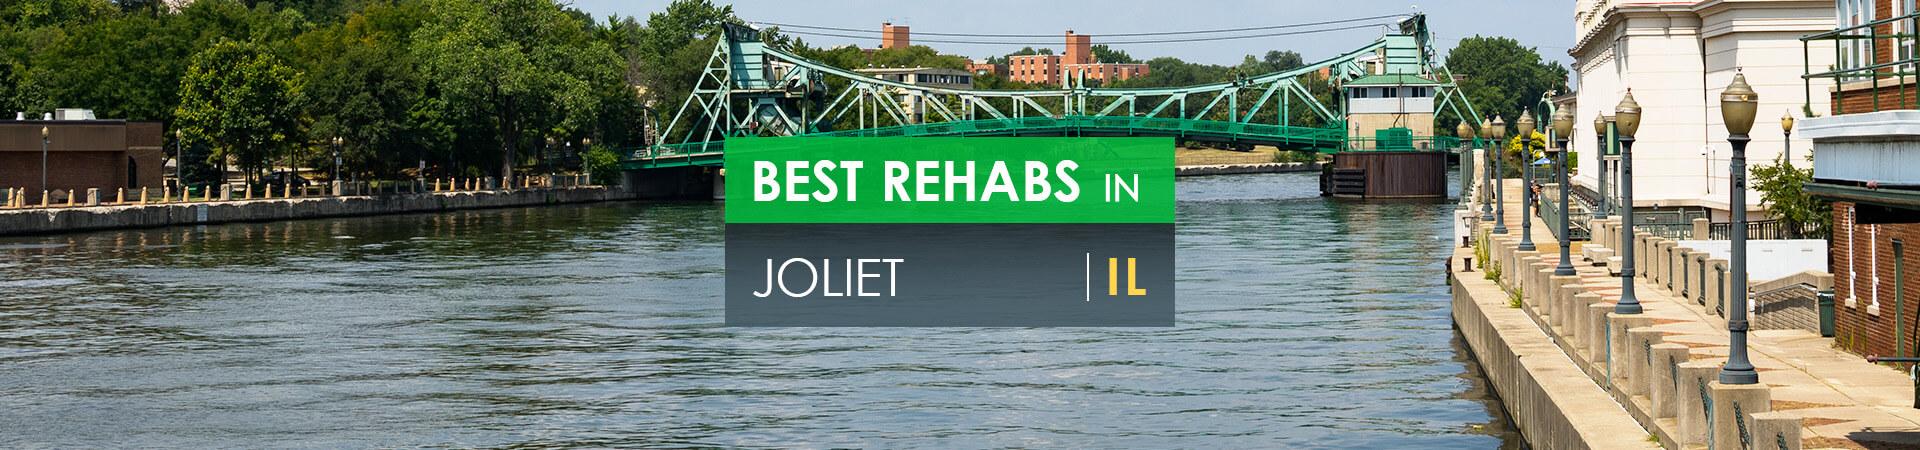 Best rehabs in Joliet, IL